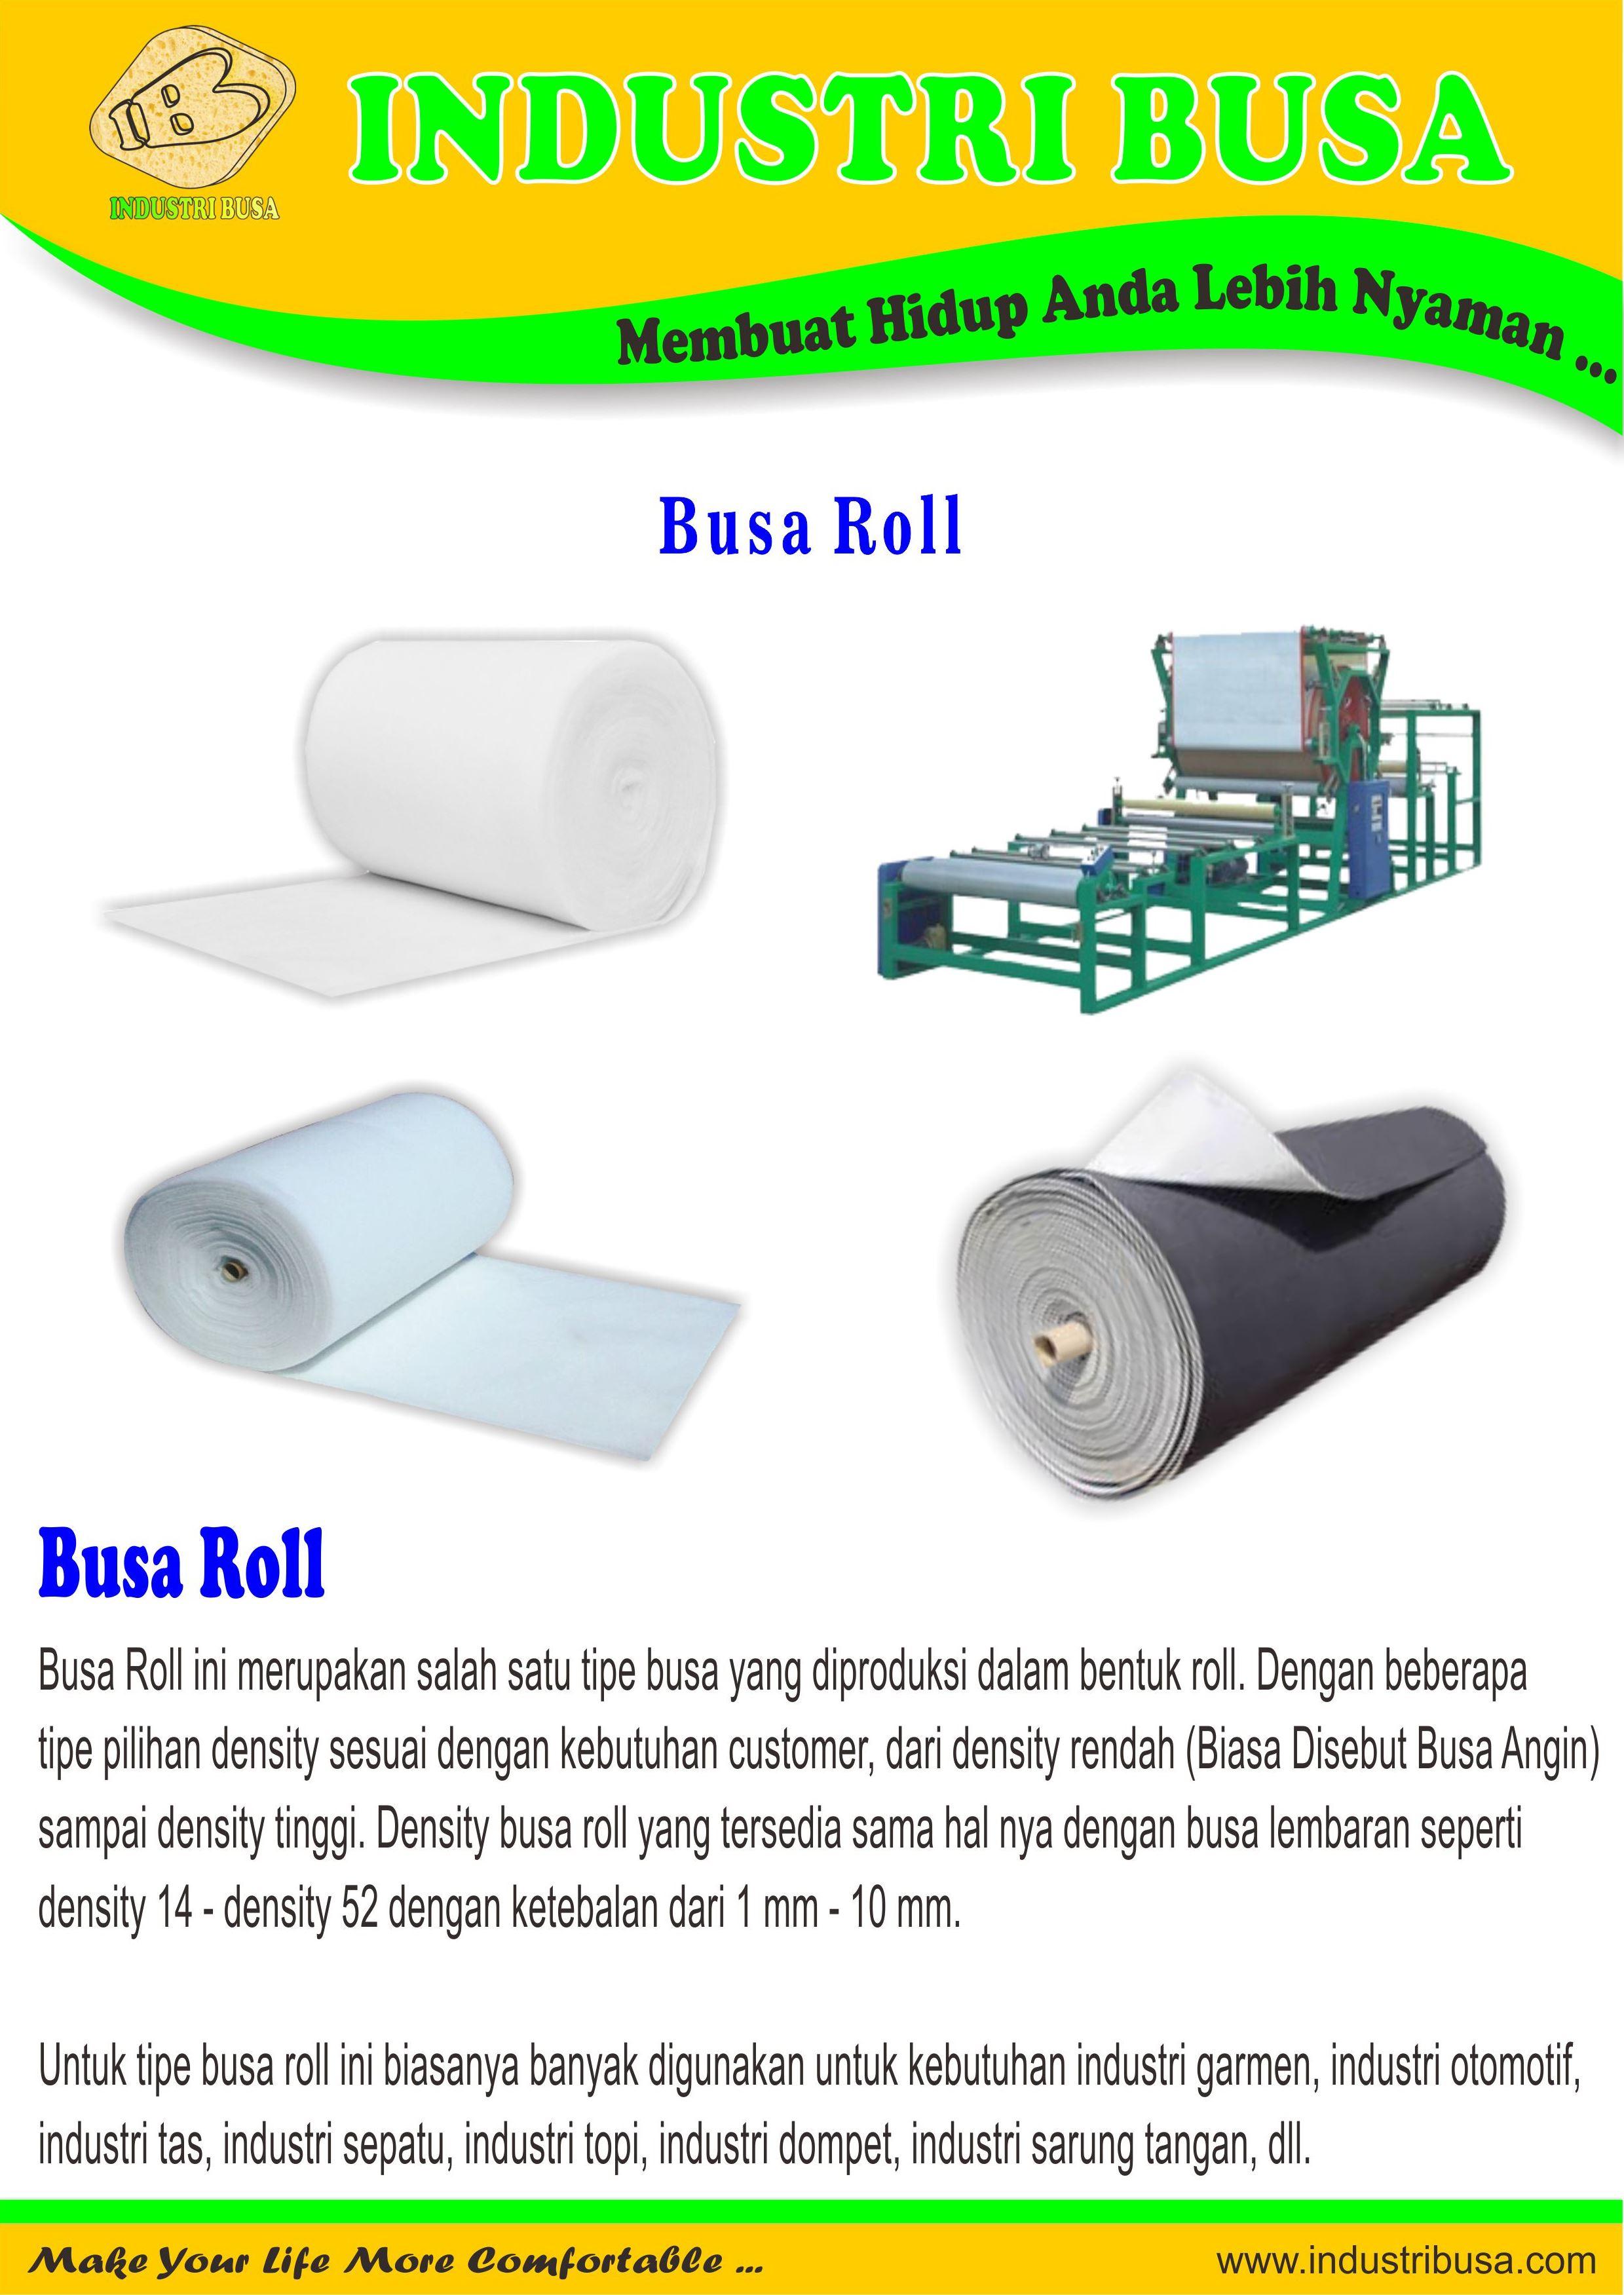 Busa Roll